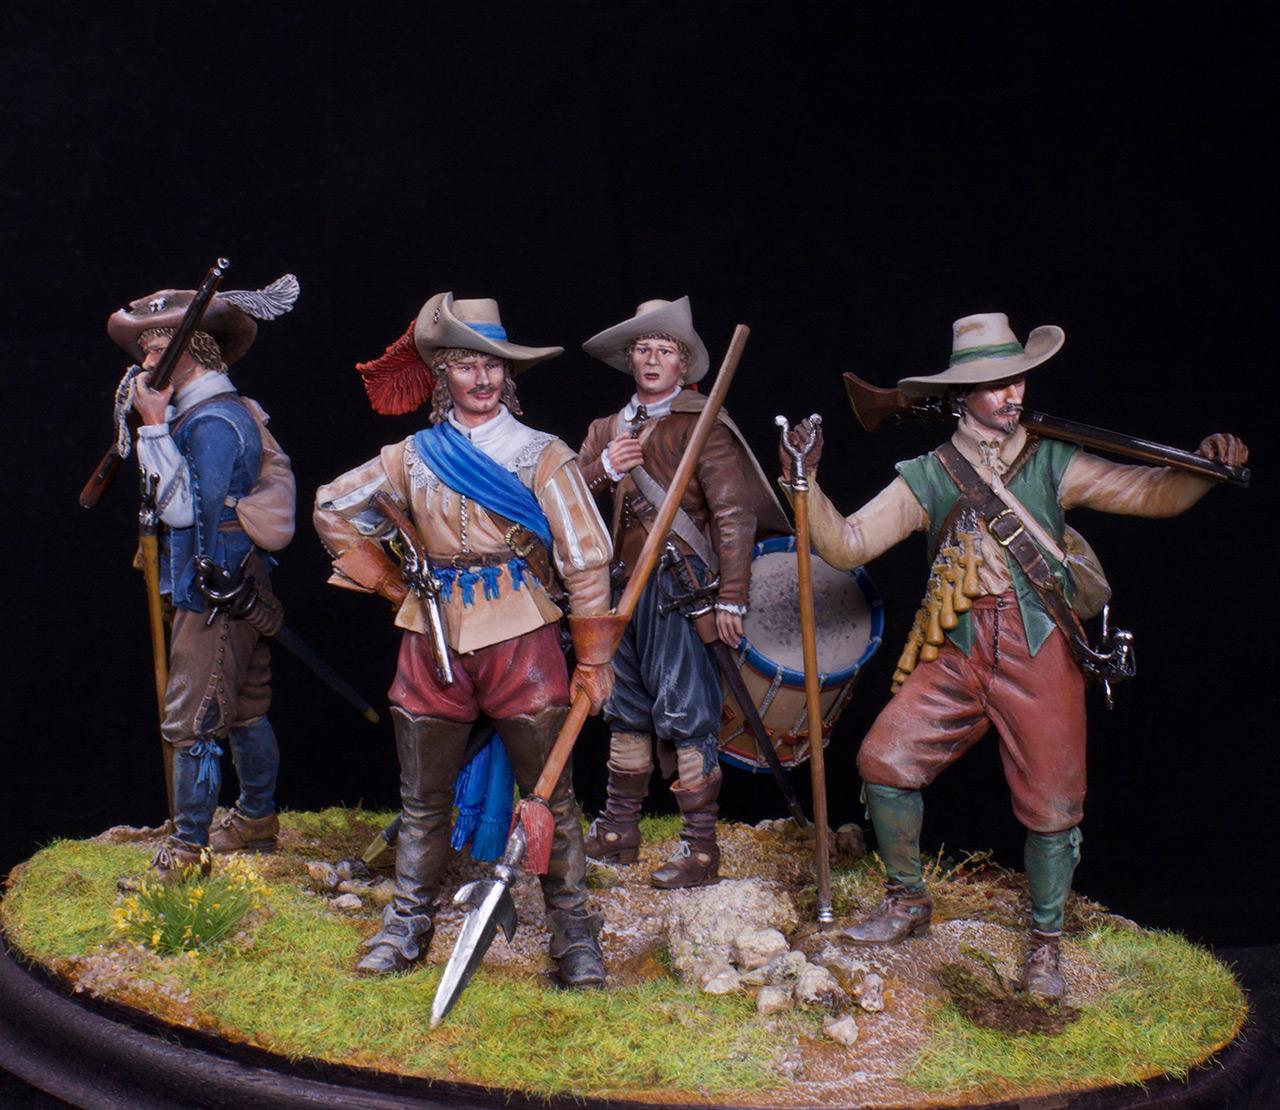 Figures: Musketeers, 1630, photo #3